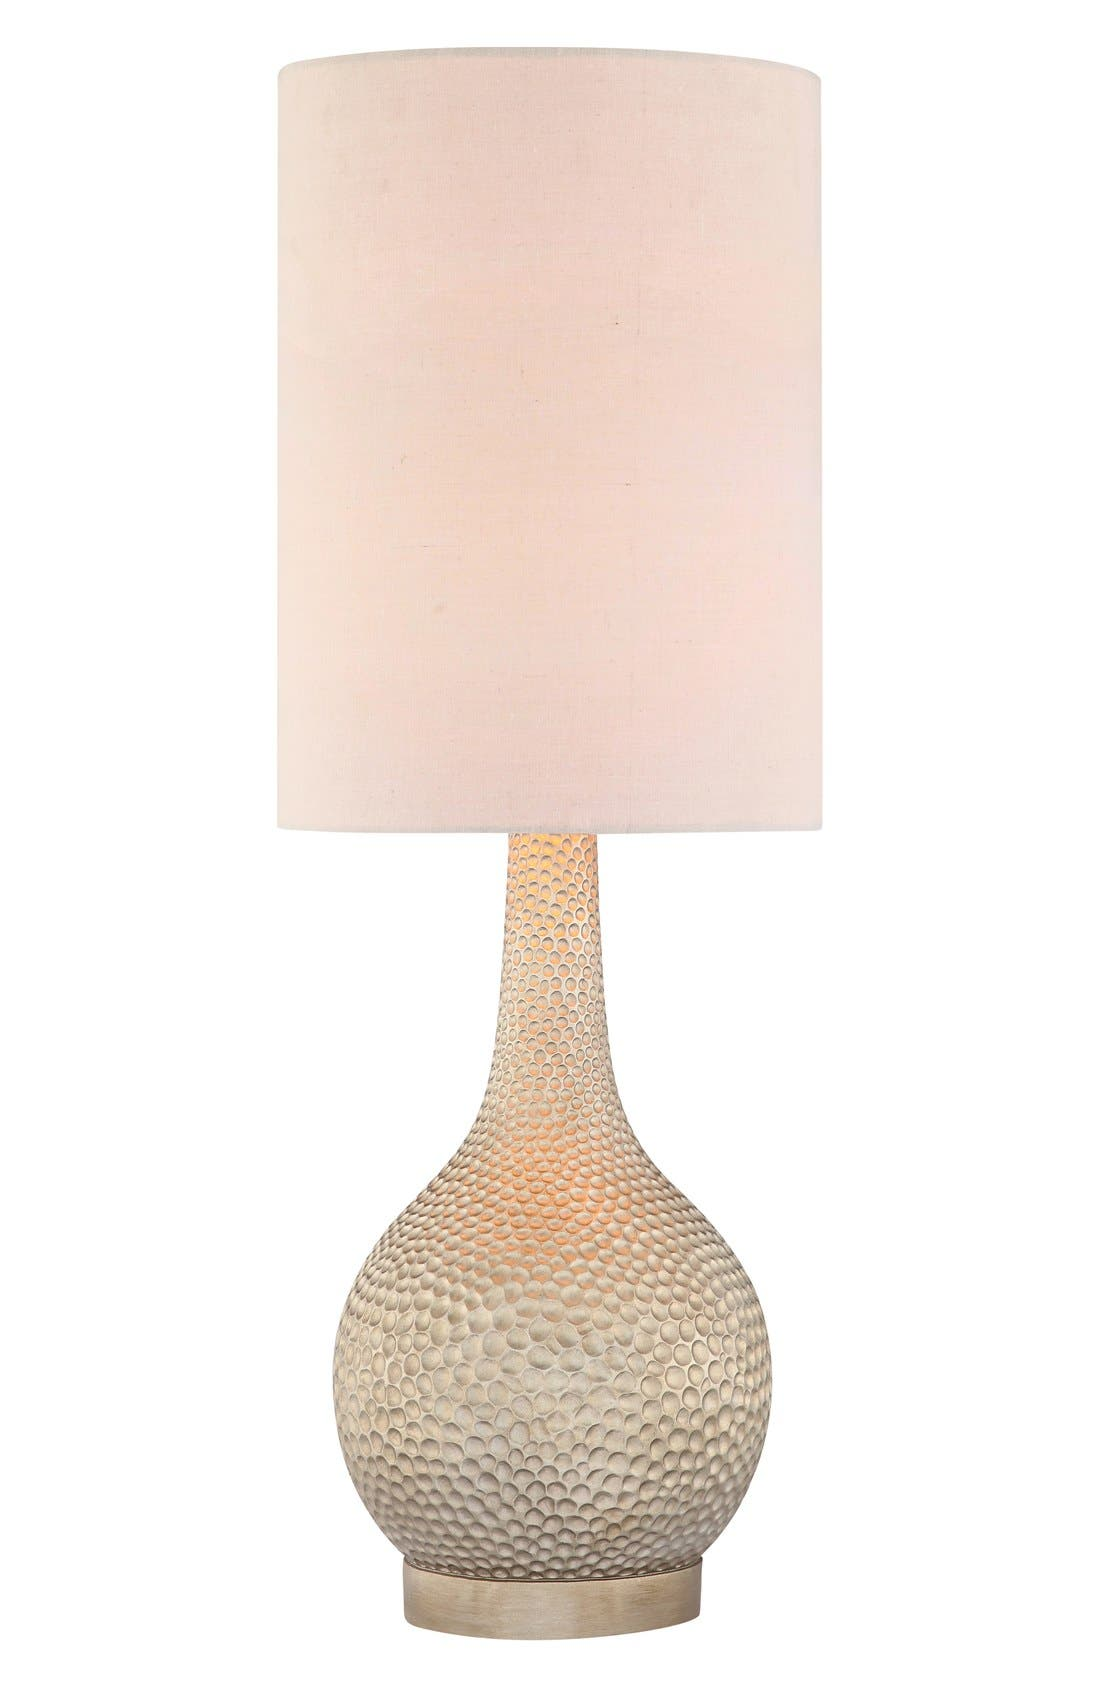 U0027Champagne Silveru0027 Hammered Metal Table Lamp, Main, ...